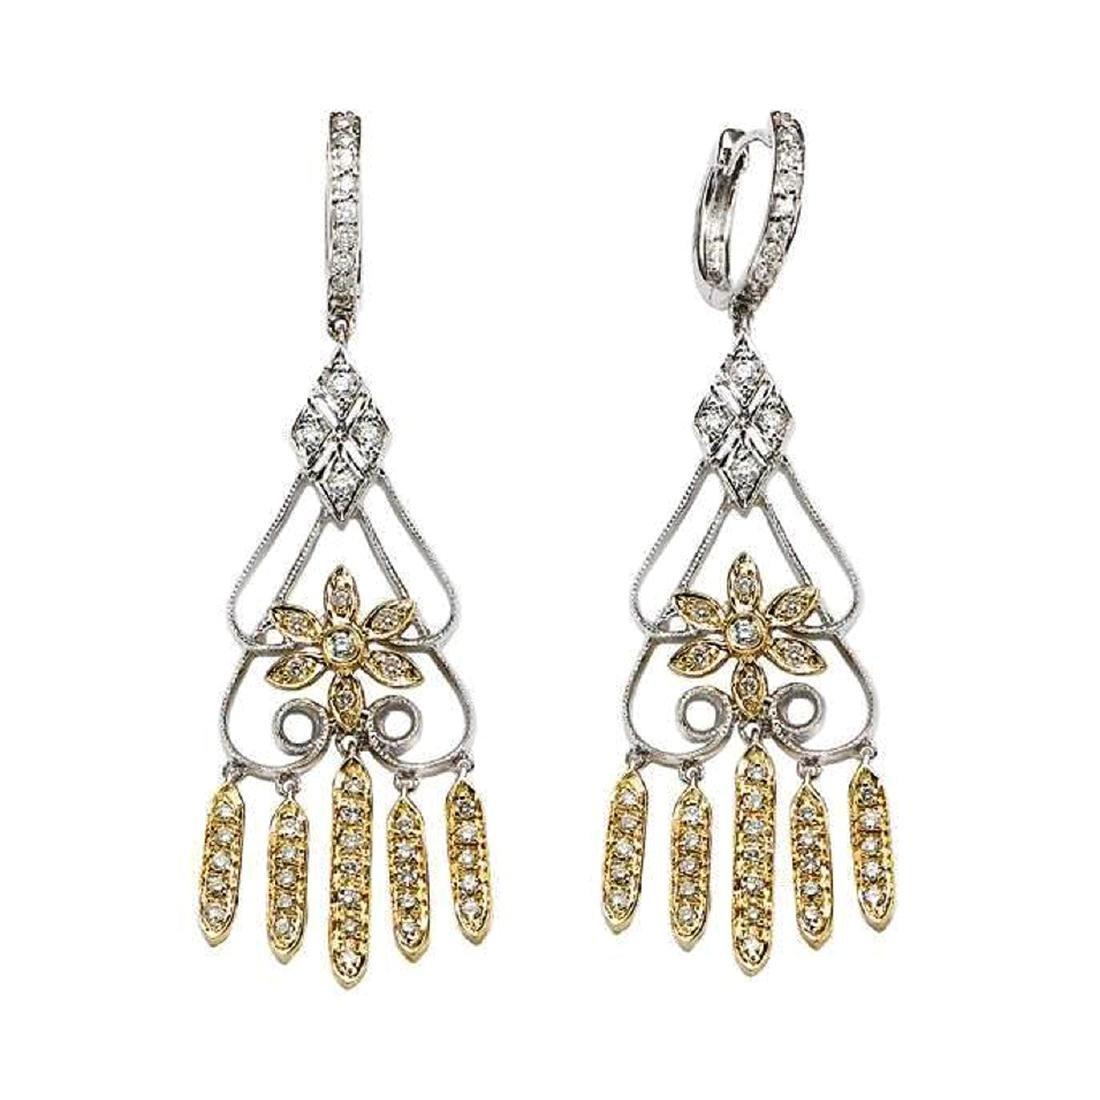 *Fine Jewelry, 14KT Two-Tone Gold, 0.70CT Diamond